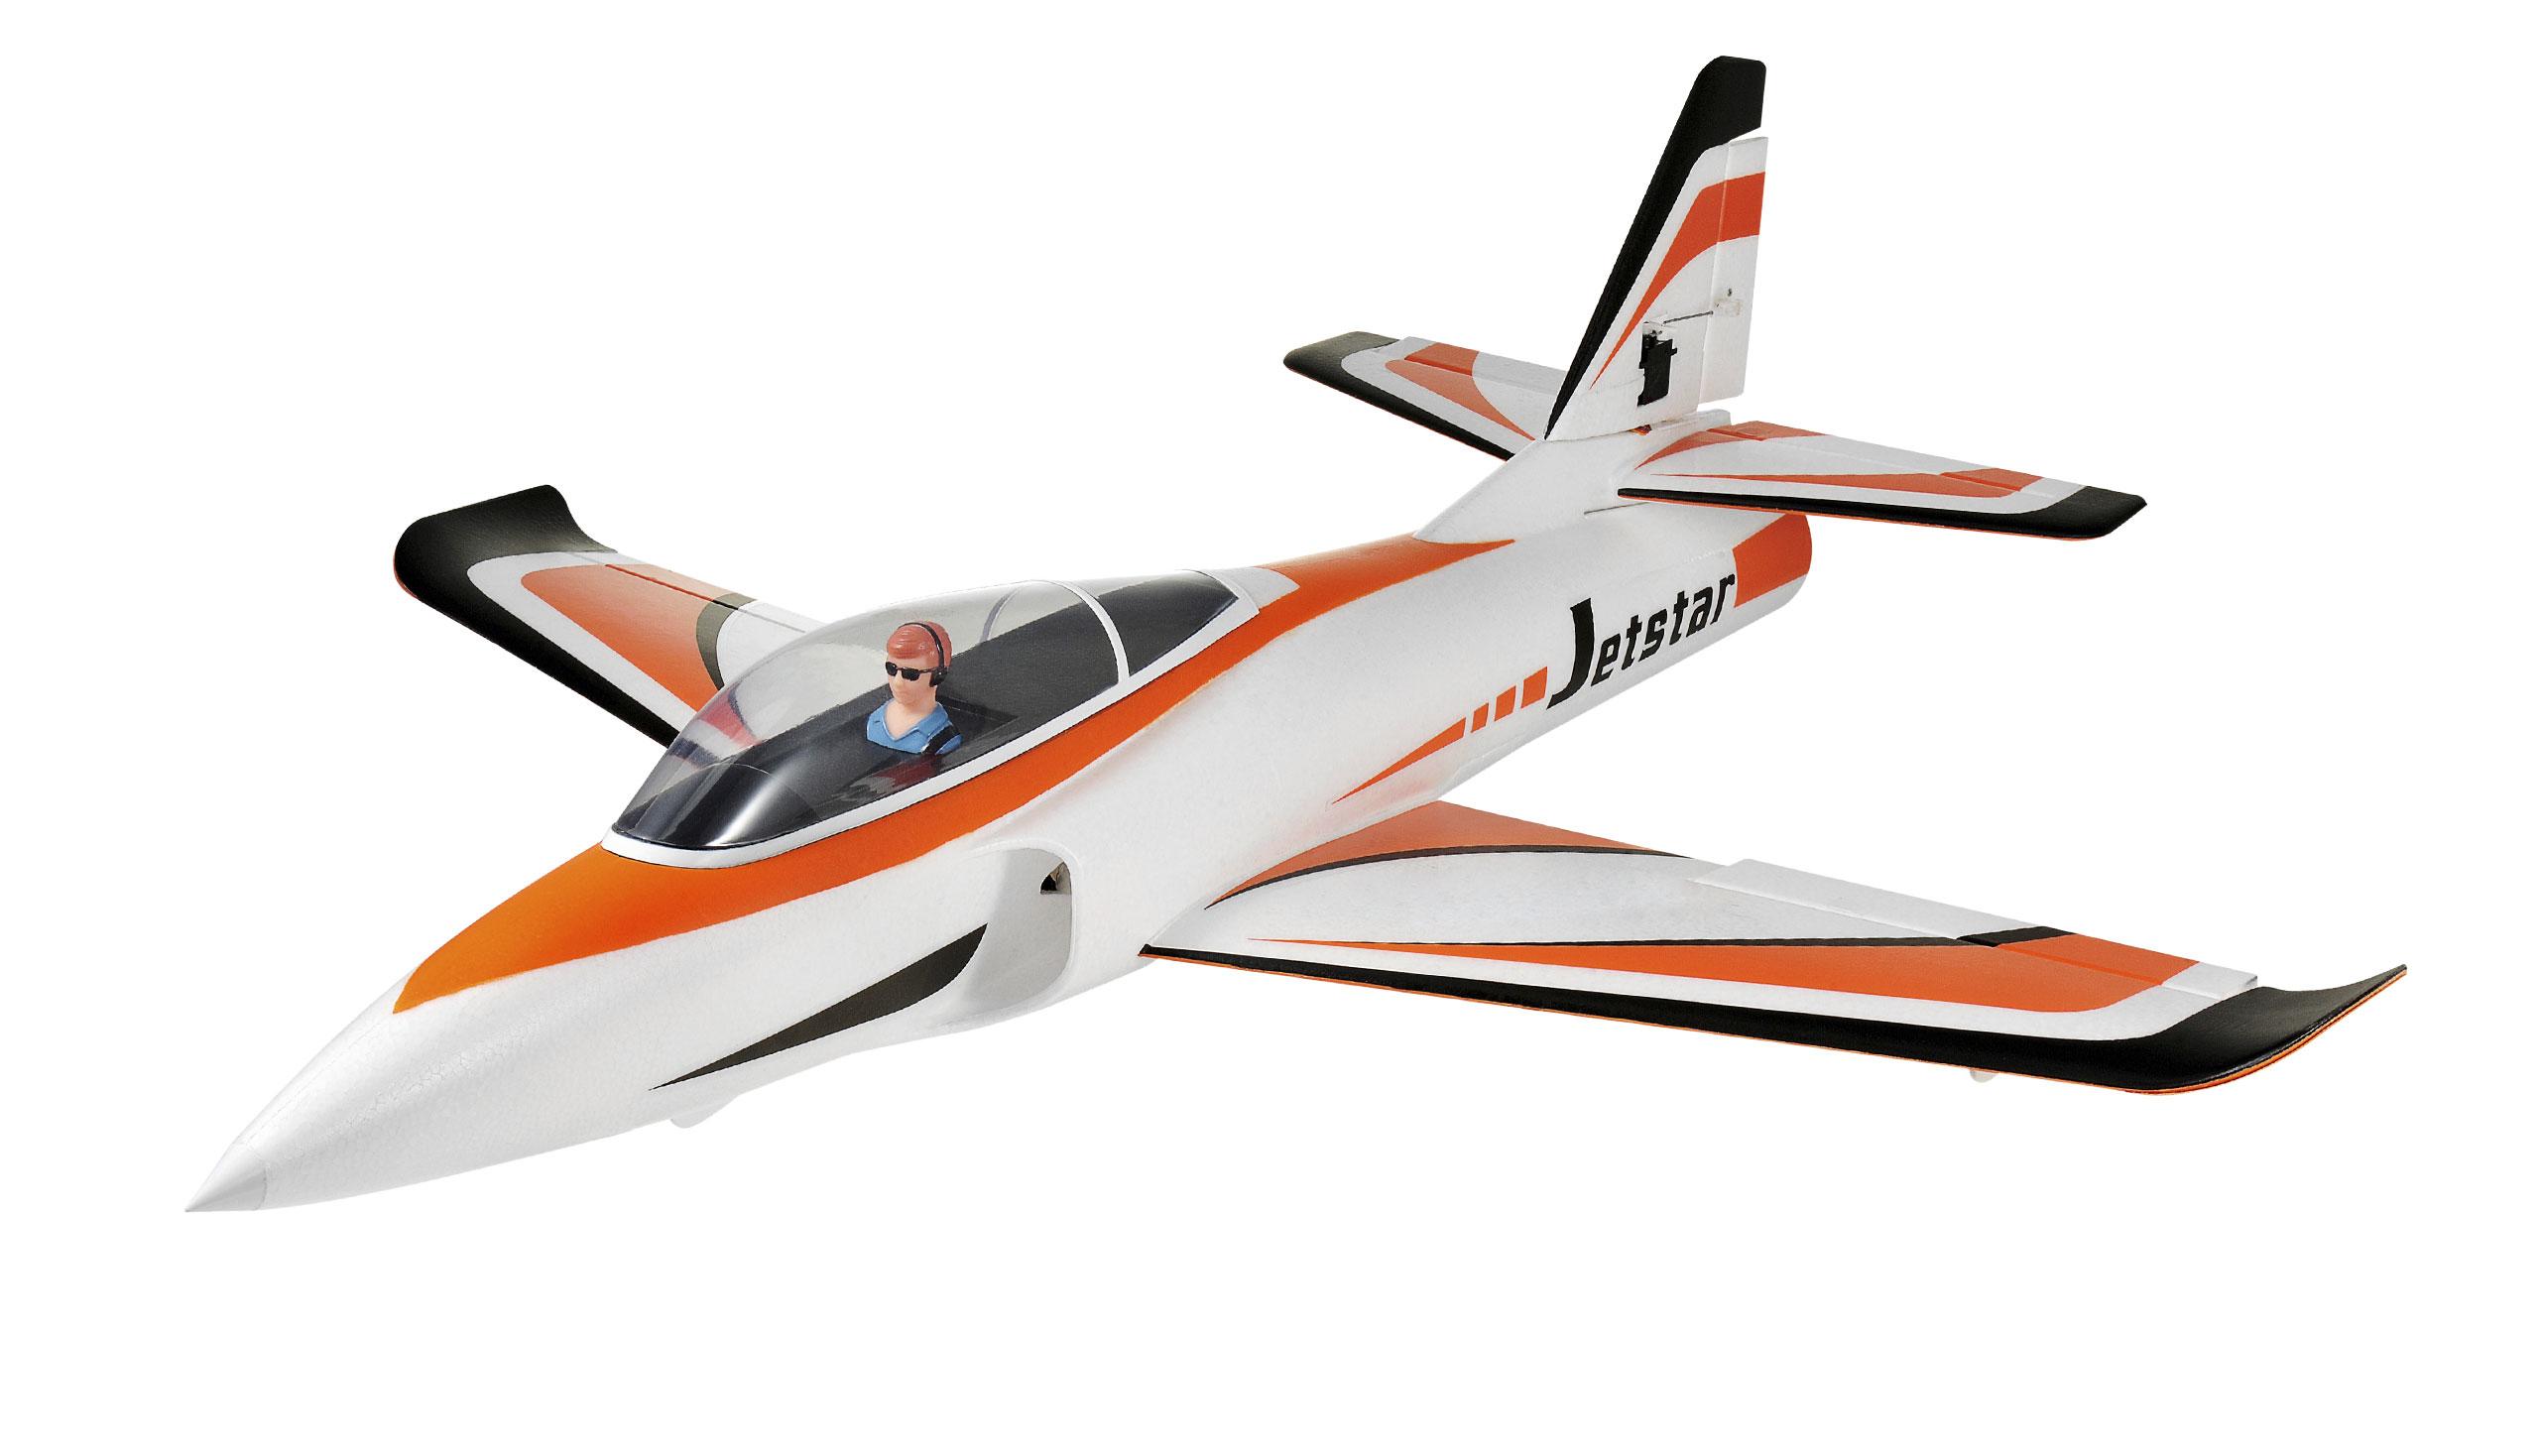 Vorschau: Amewi JetStar V2 - Funkgesteuertes (RC) Kampfflugzeug - Plug-N-Play(PNP) - Schwarz - Orange - Weiß - Elektromotor - Junge - Bürstenlos